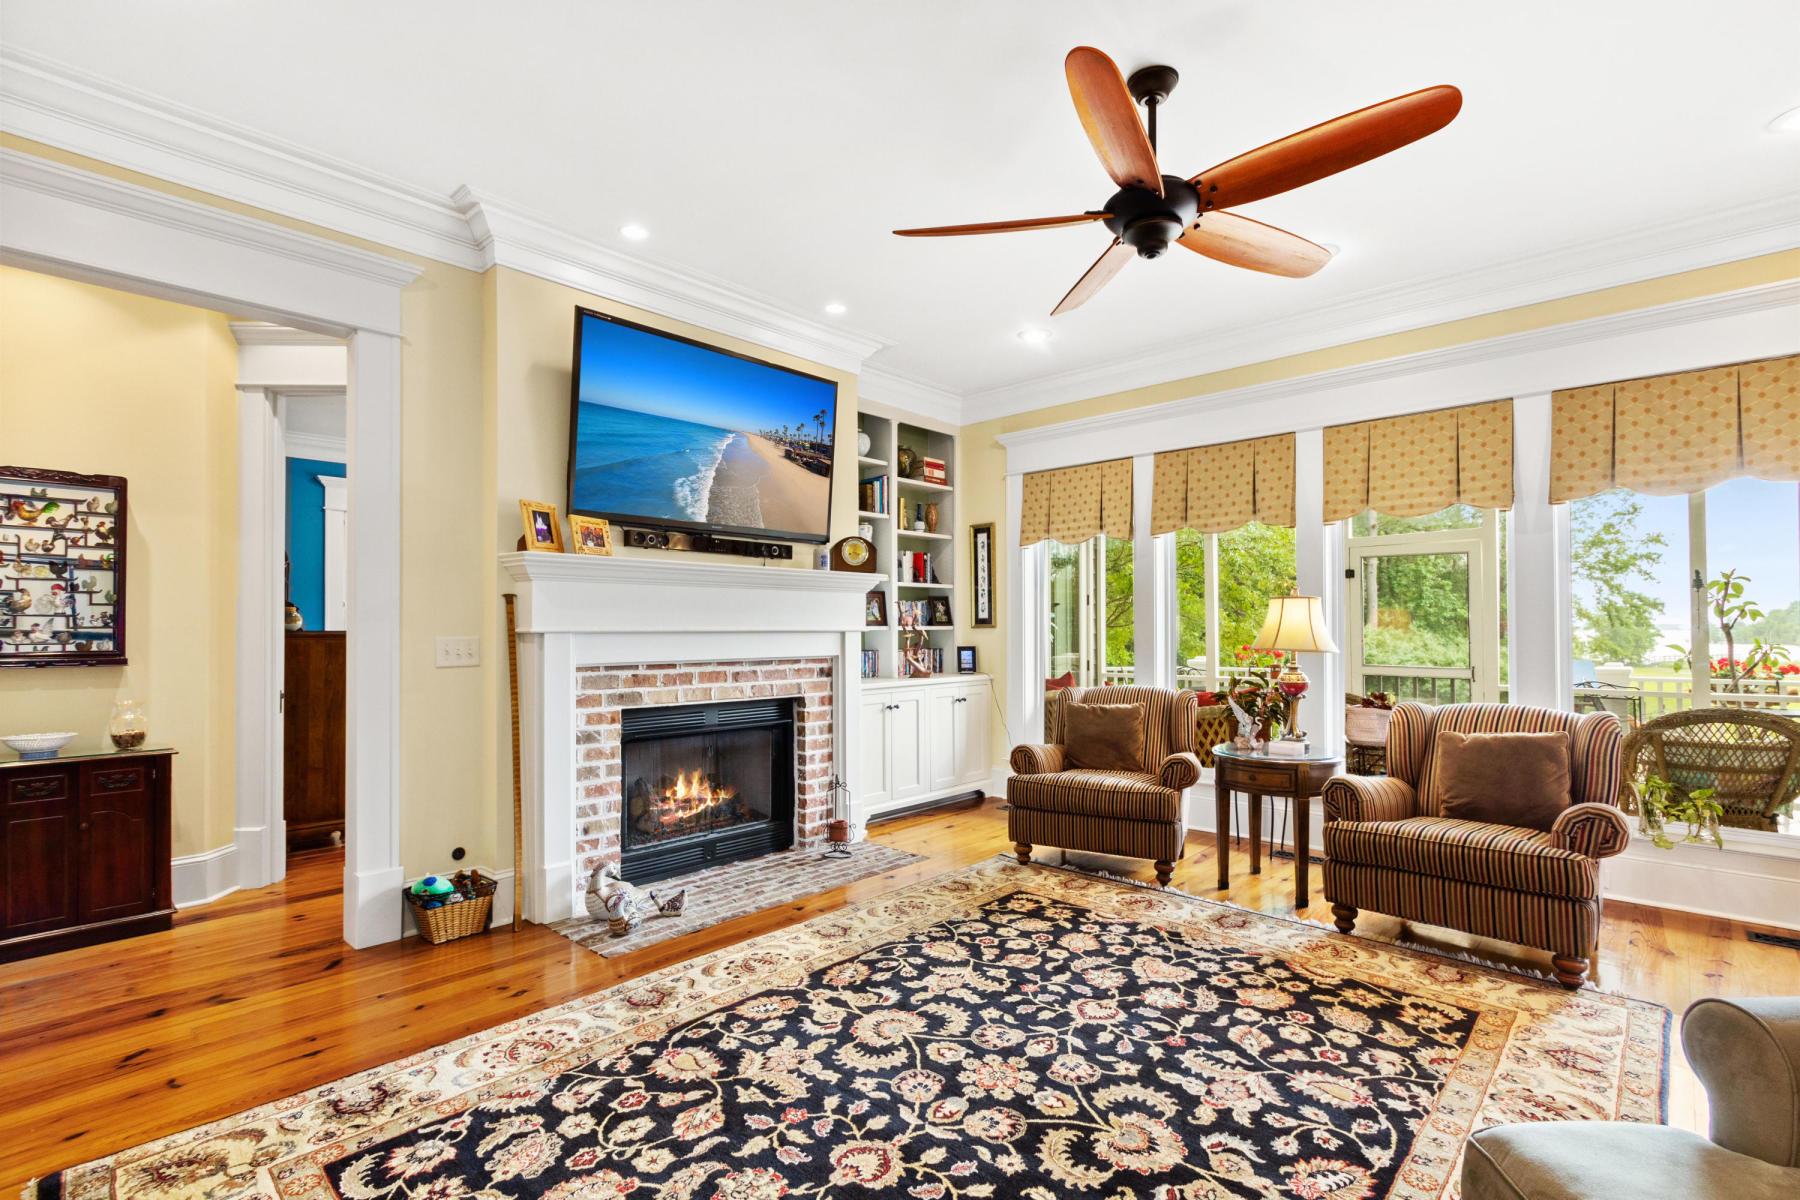 Broughton Hall Homes For Sale - 2058 Lakeshore, Pinopolis, SC - 21